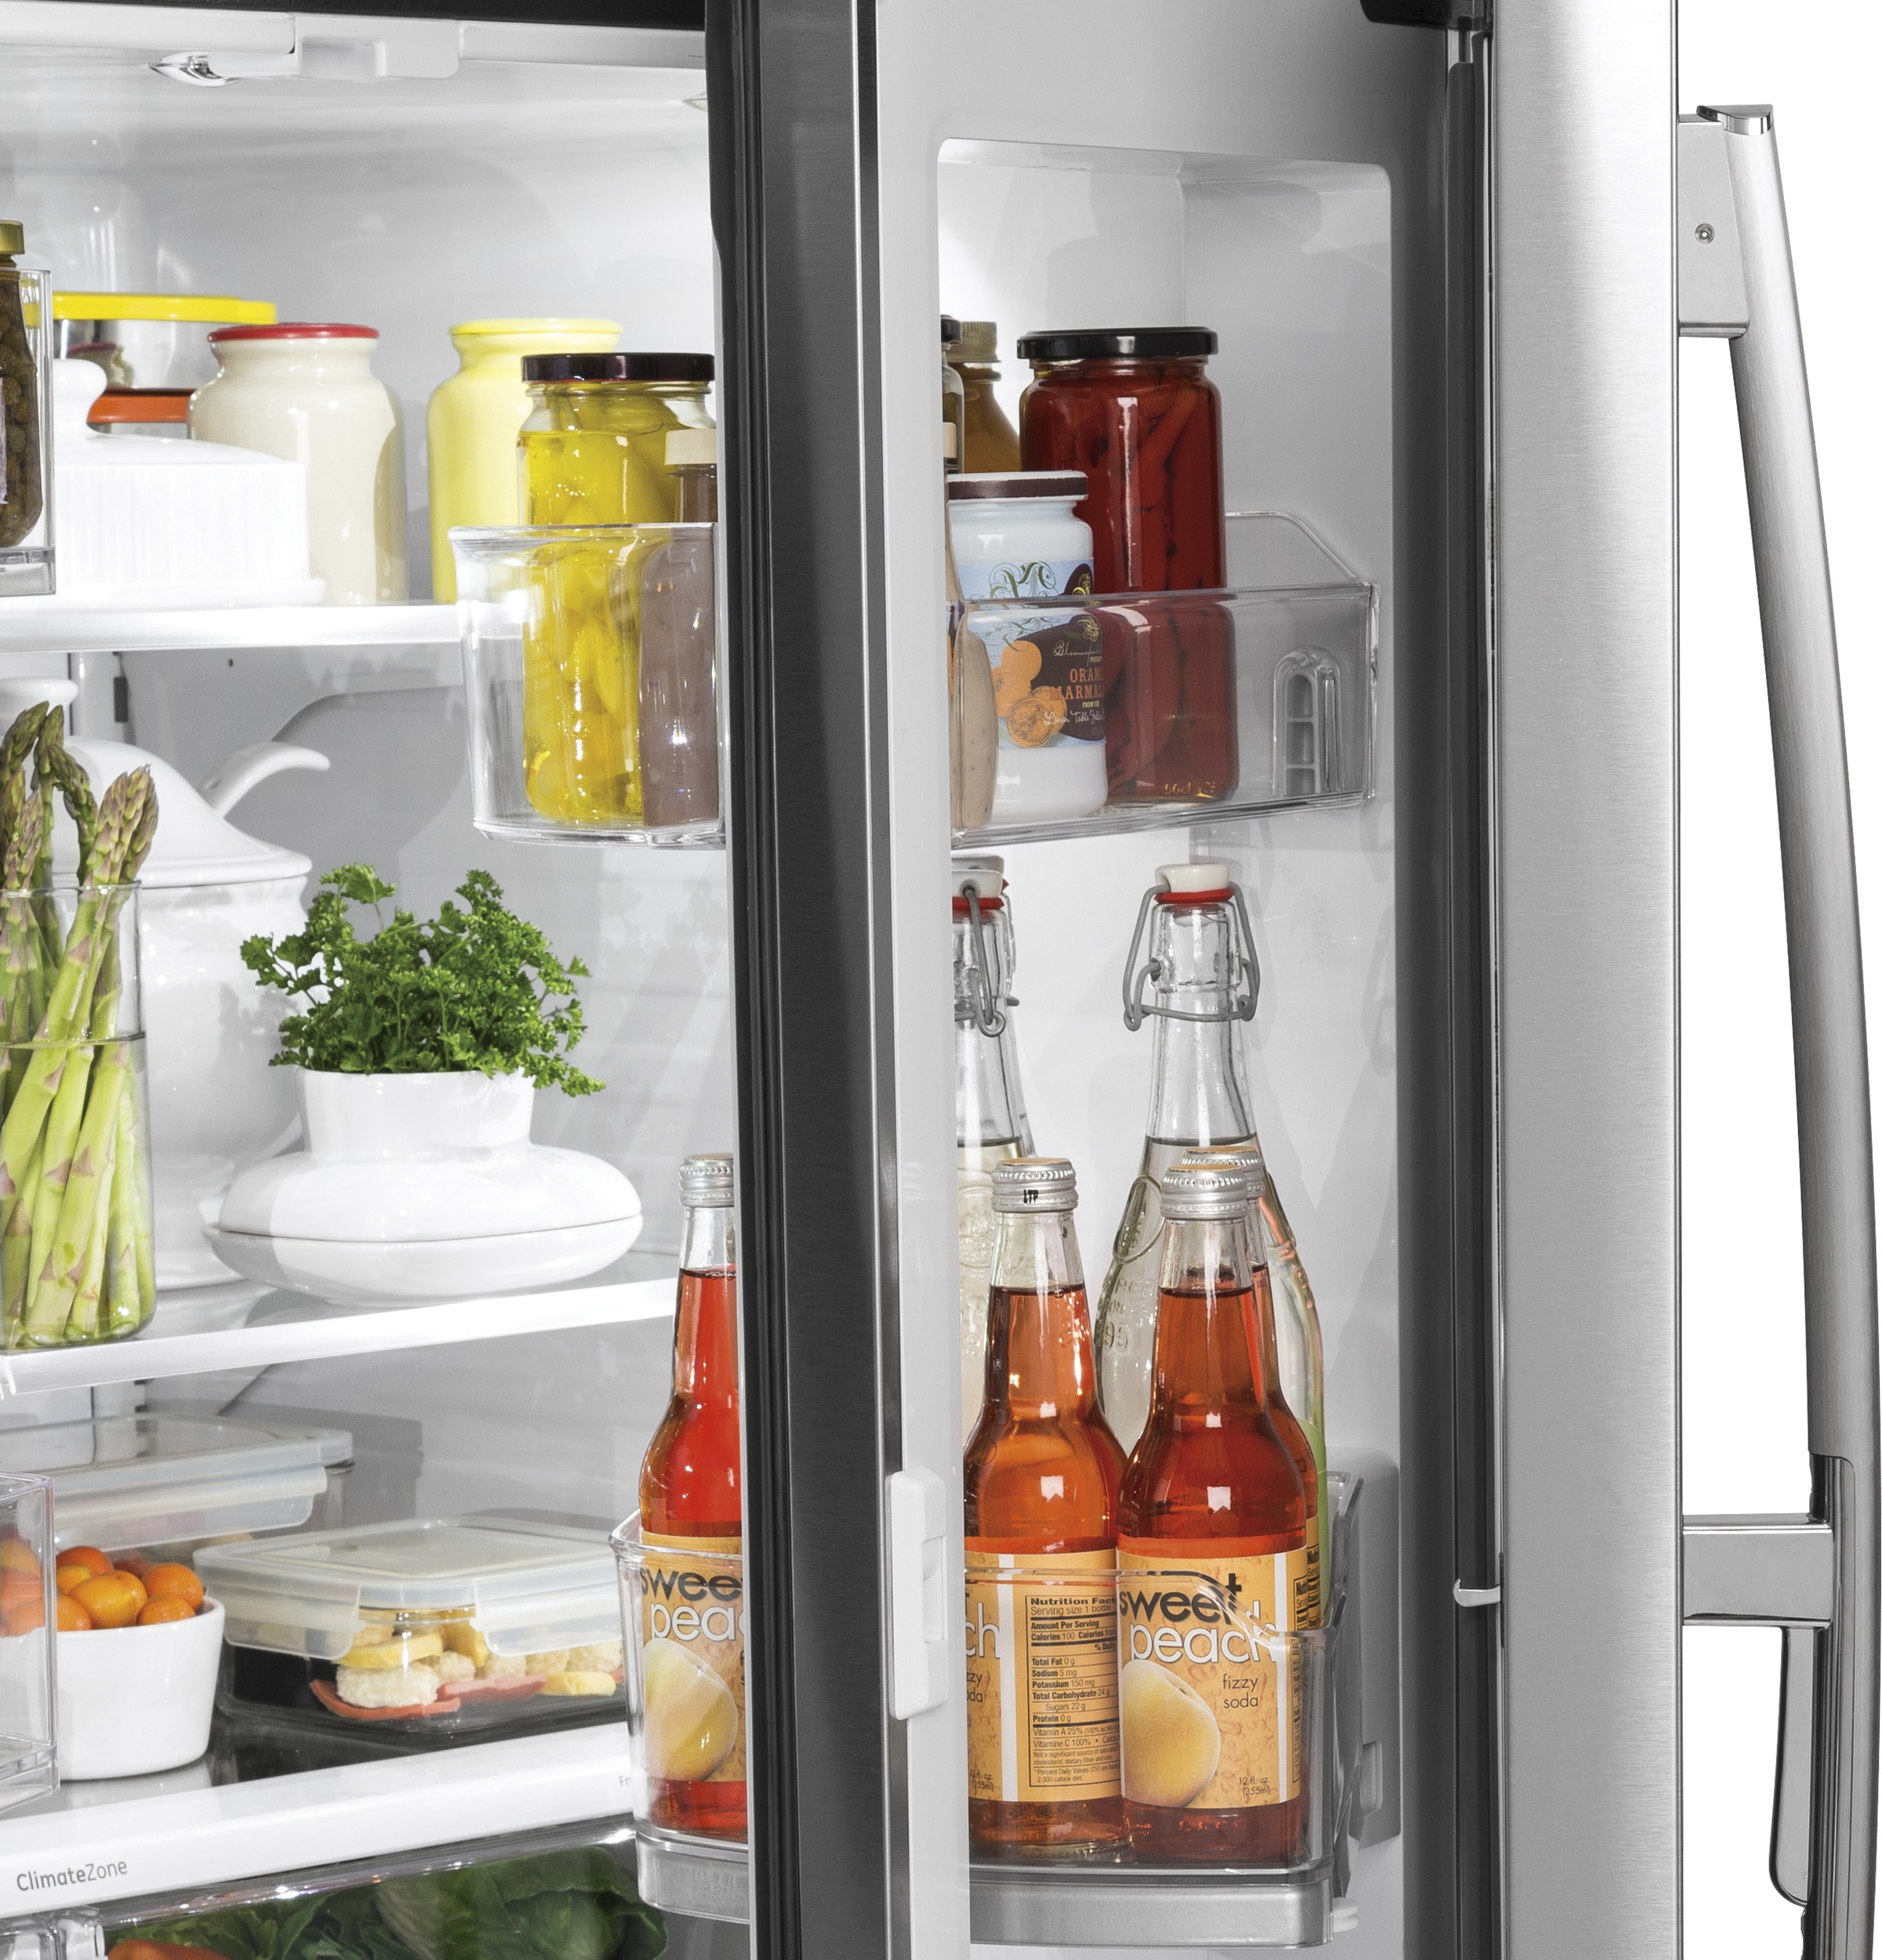 Model: PYD22KSLSS | GE Profile™ Series 22.2 Cu. Ft. Counter-Depth French-Door Refrigerator